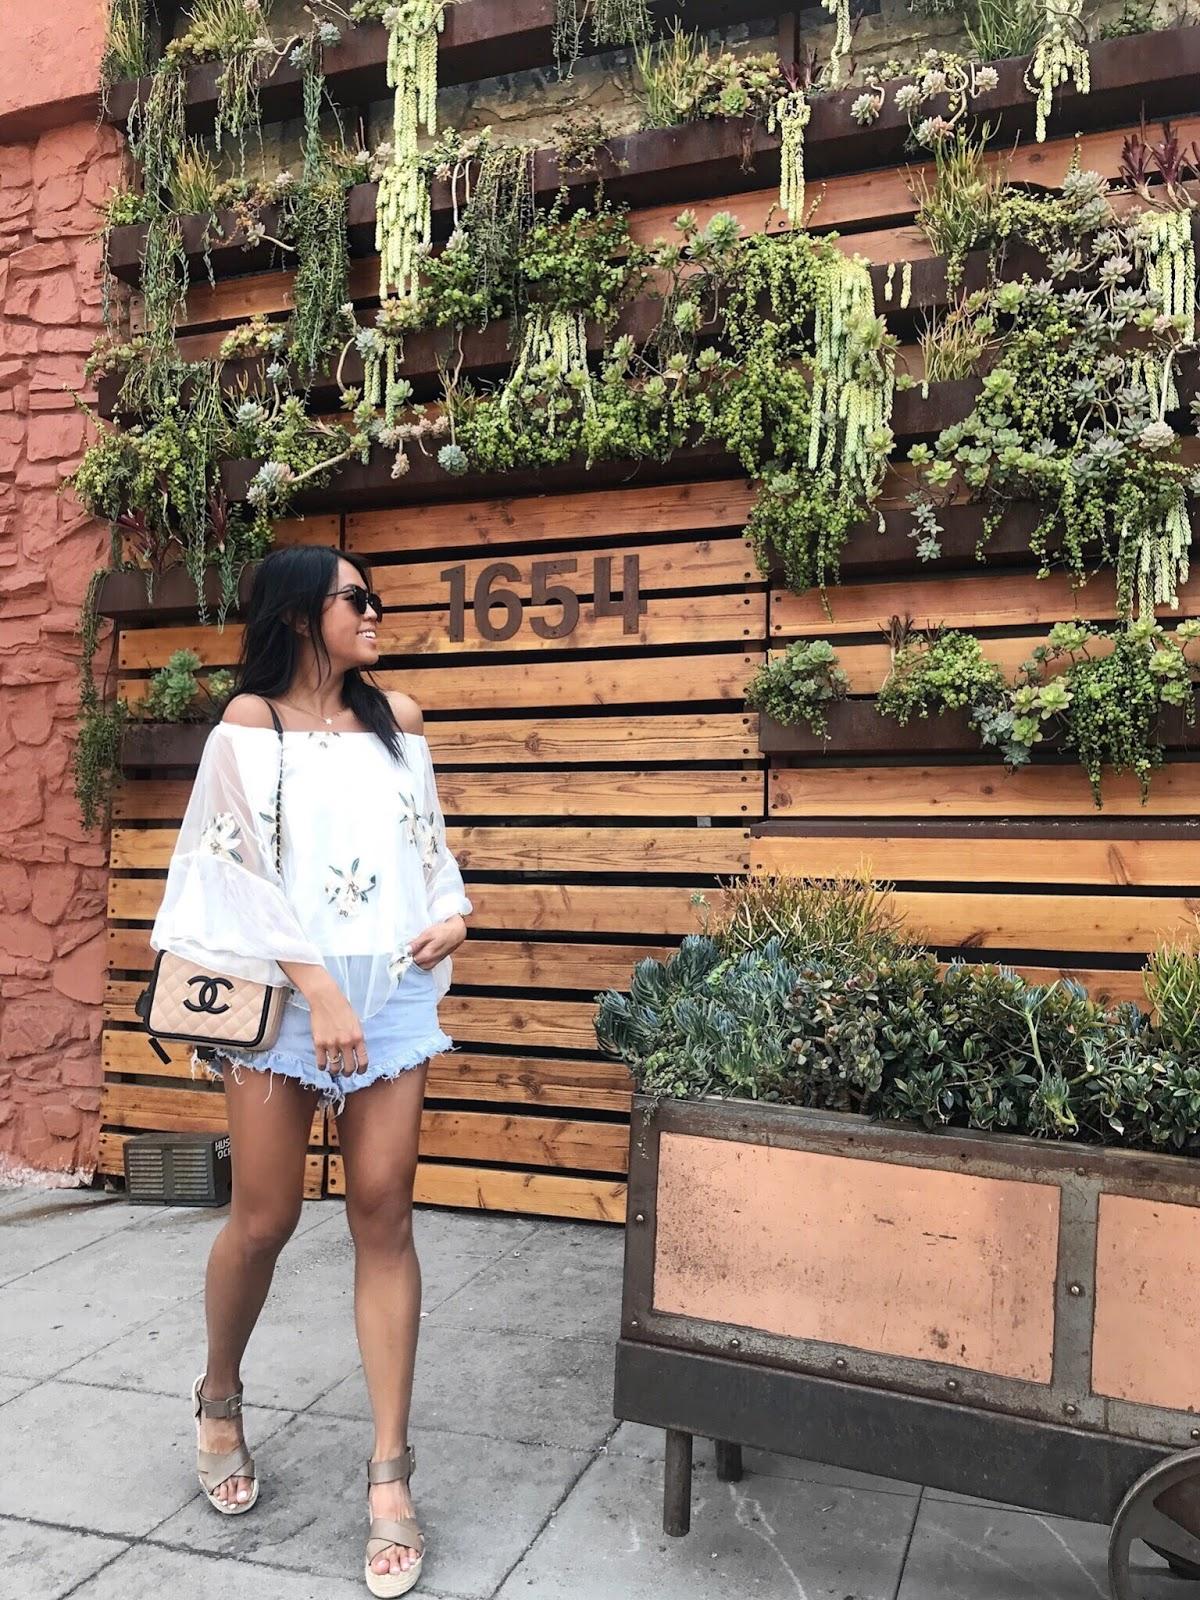 Instagram Worthy Places in San Diego